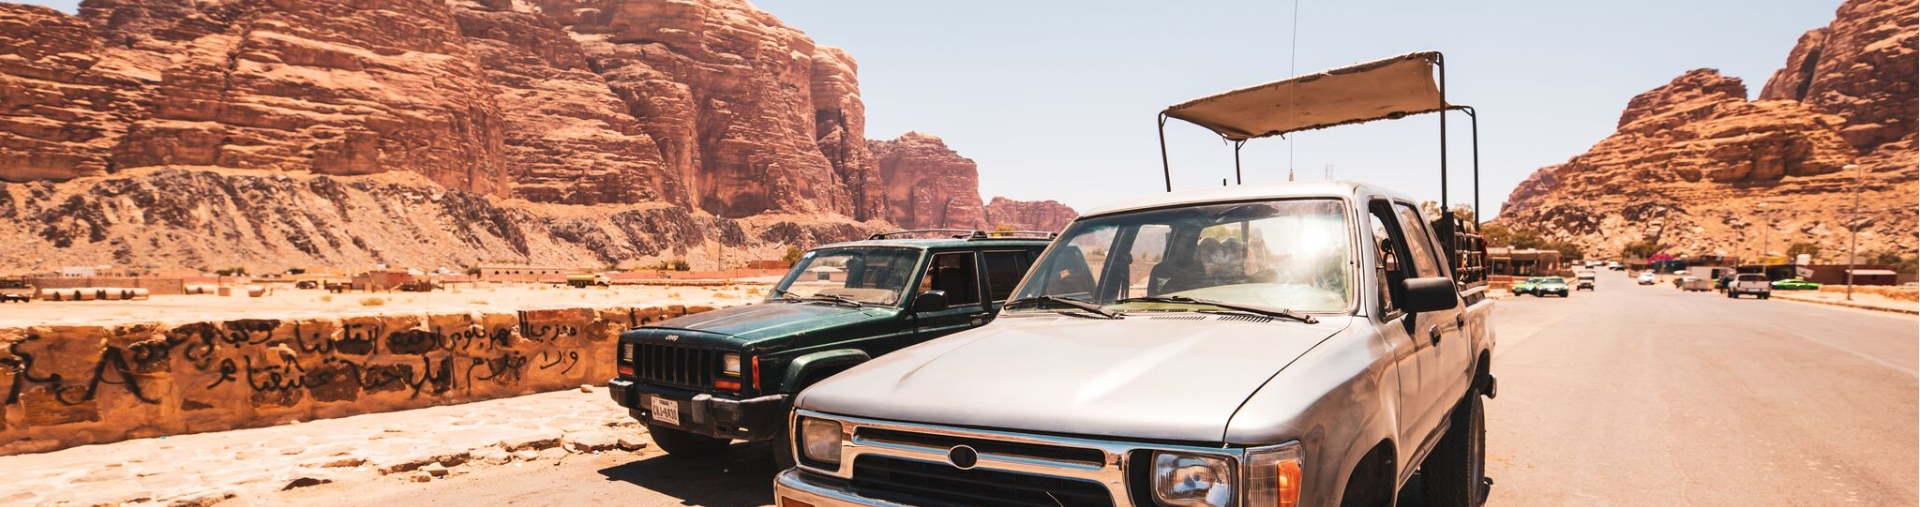 Jeep Safari of Wadi Rum